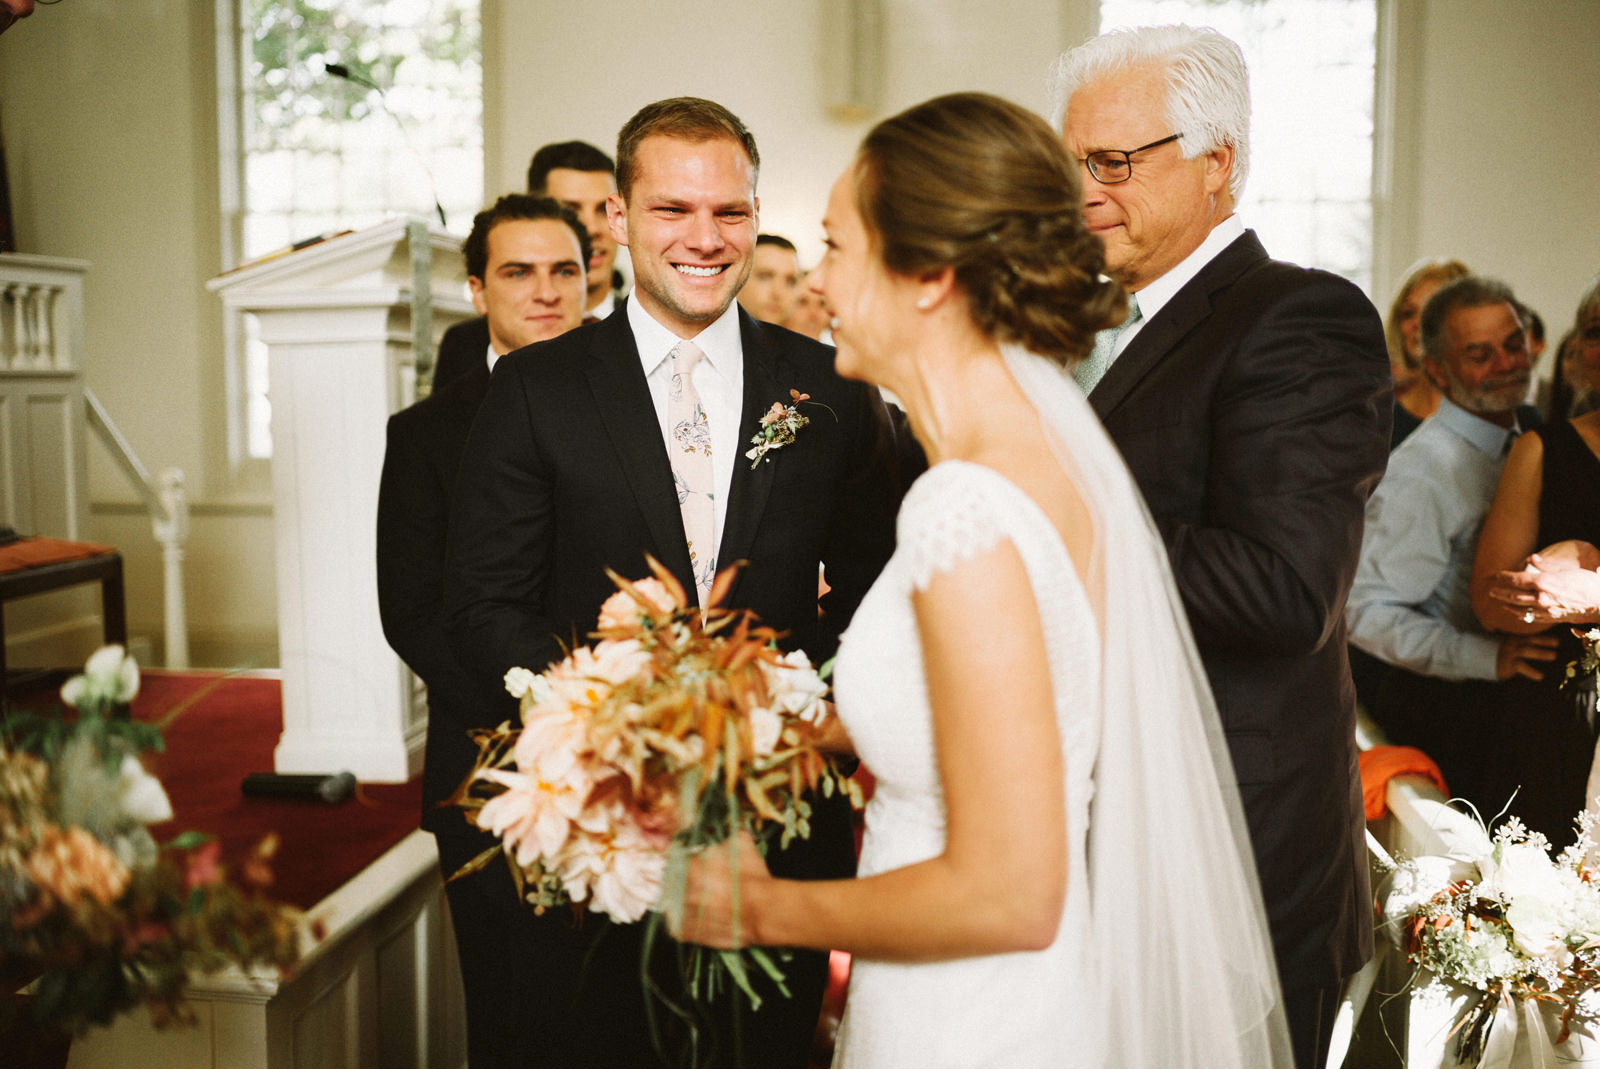 bridgeport-wedding-051 BRIDGEPORT, CONNECTICUT BACKYARD WEDDING